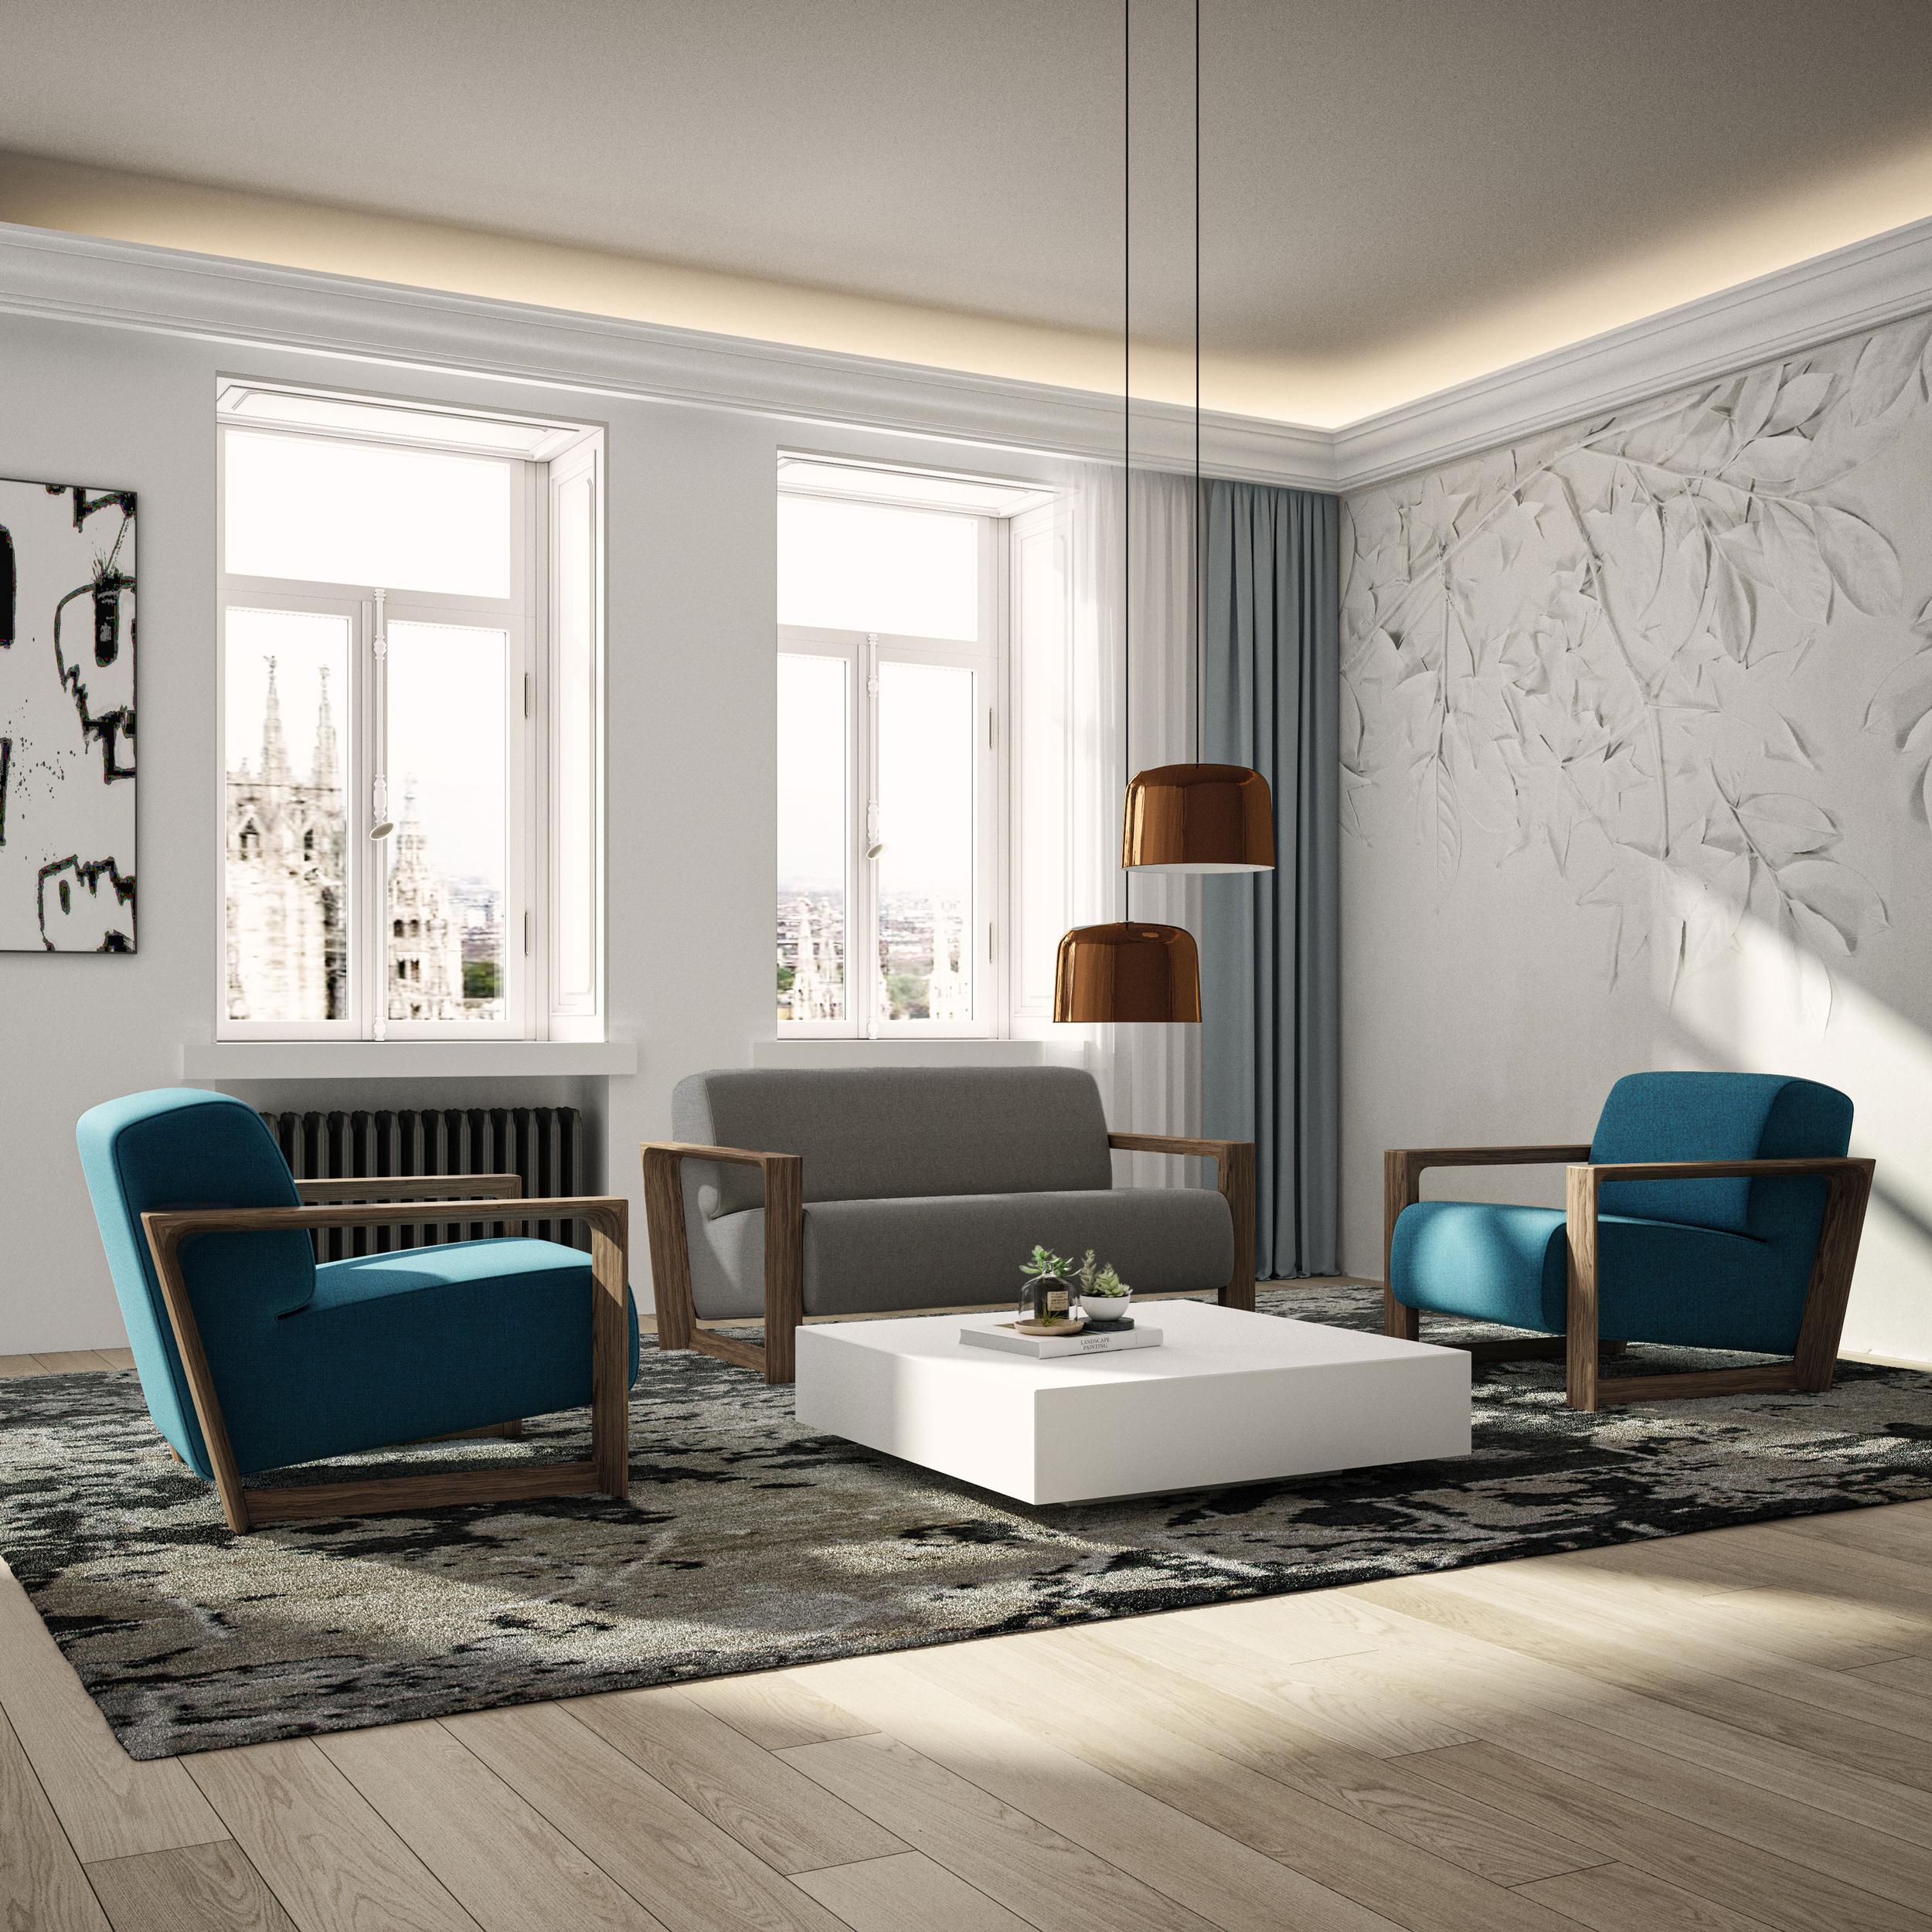 canapé-design-bois-arco